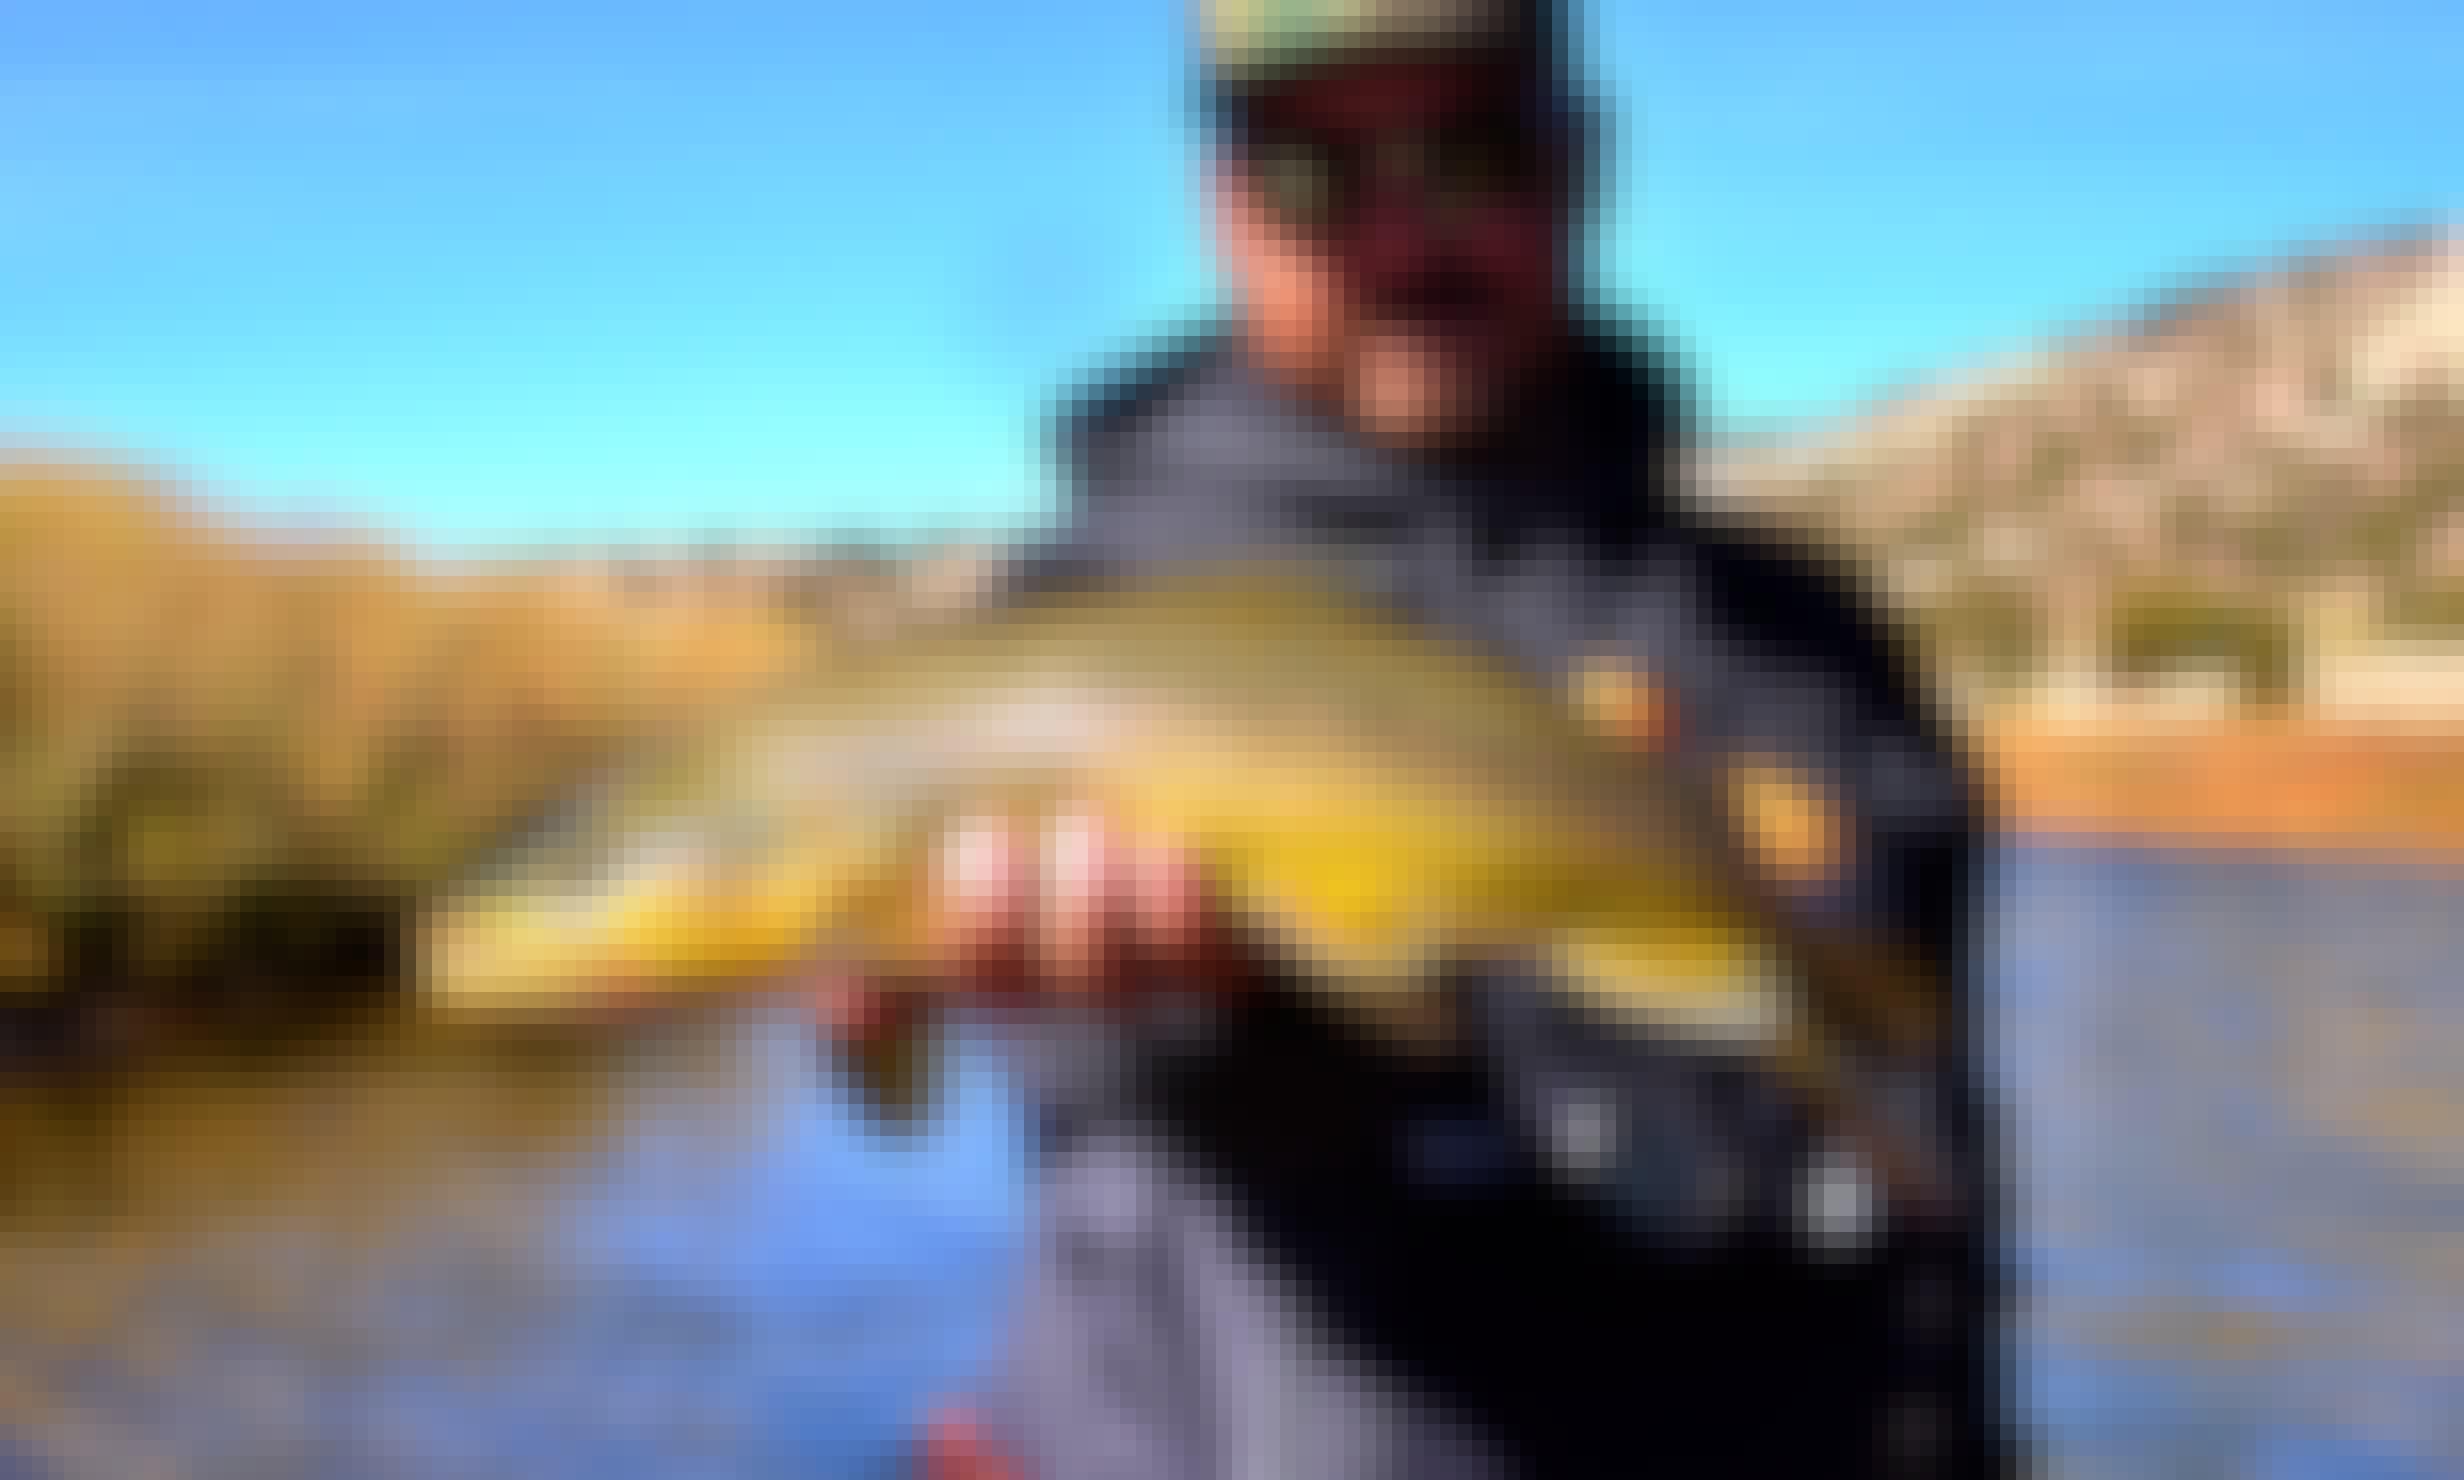 Rent a 16 ft Drift Boats for Fly Fishing in Dutch John, Utah